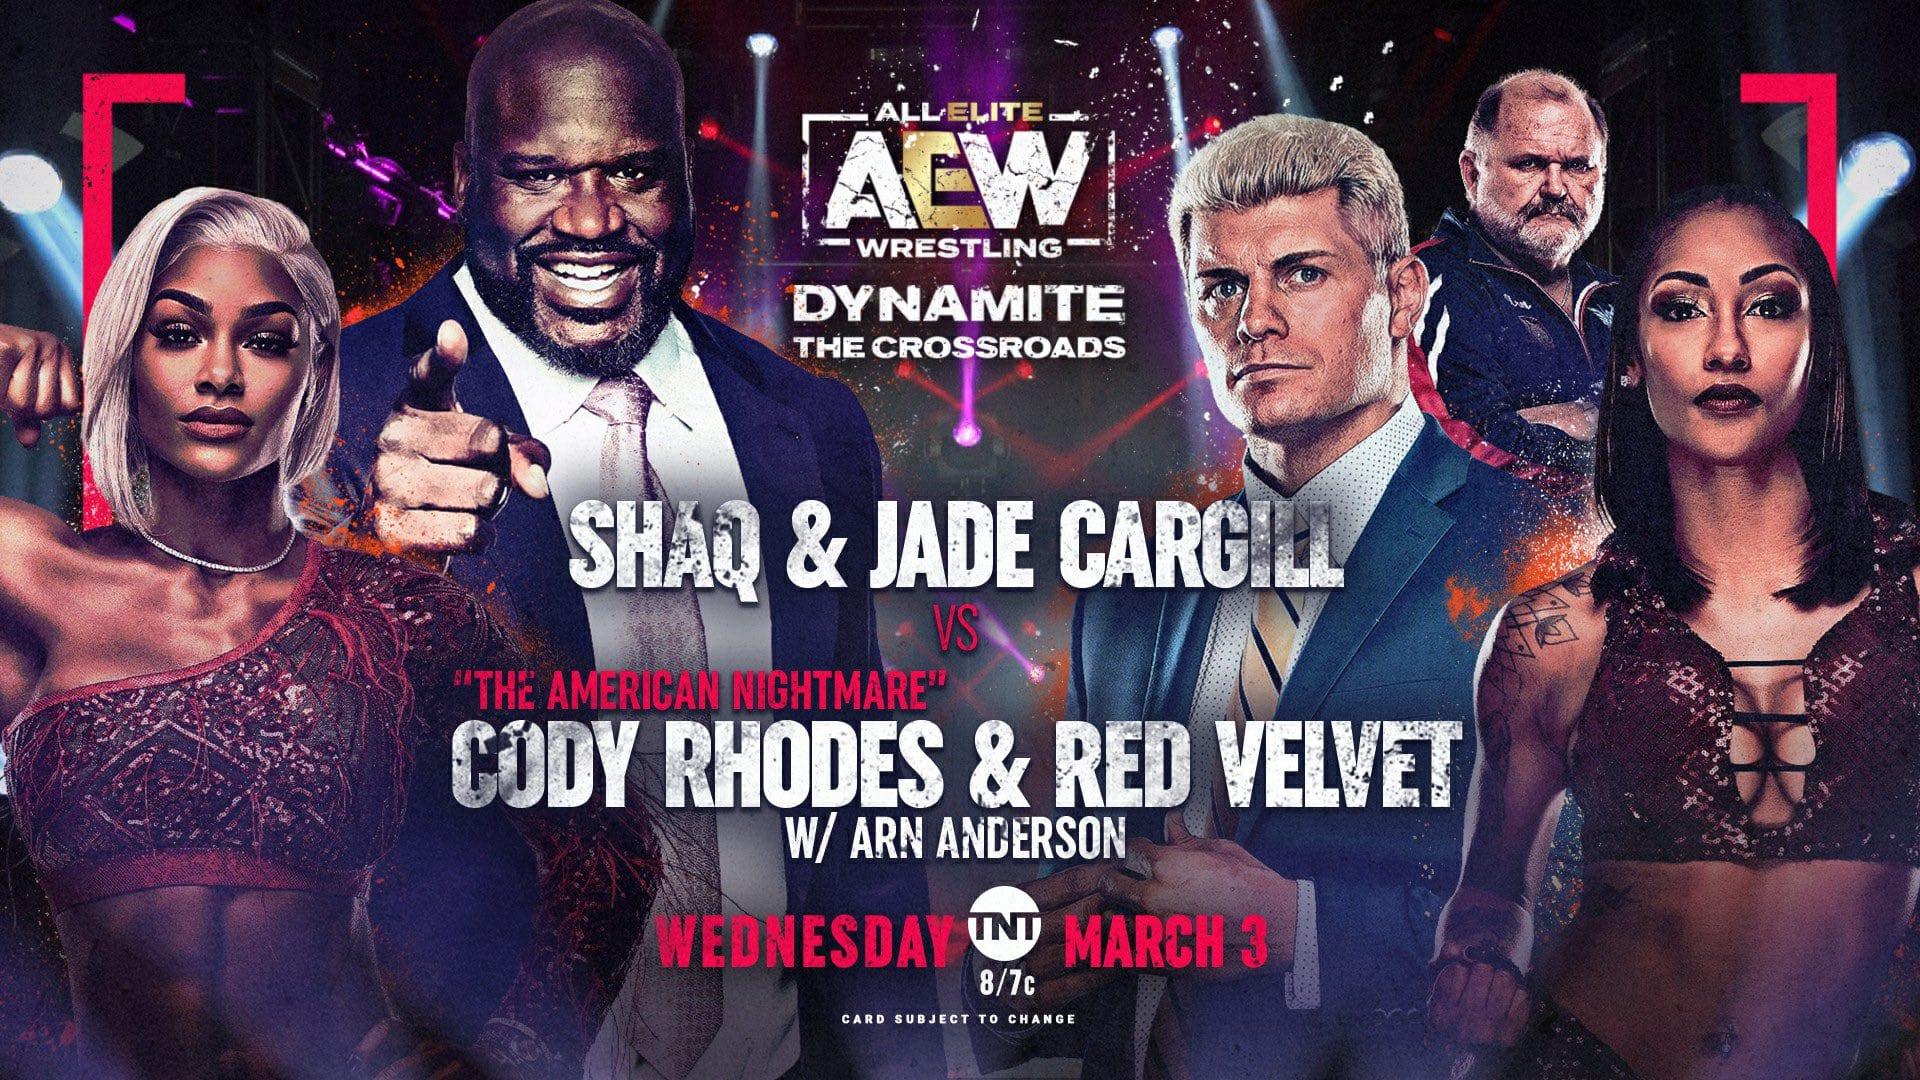 Big Match To Open Tonight's AEW Dynamite